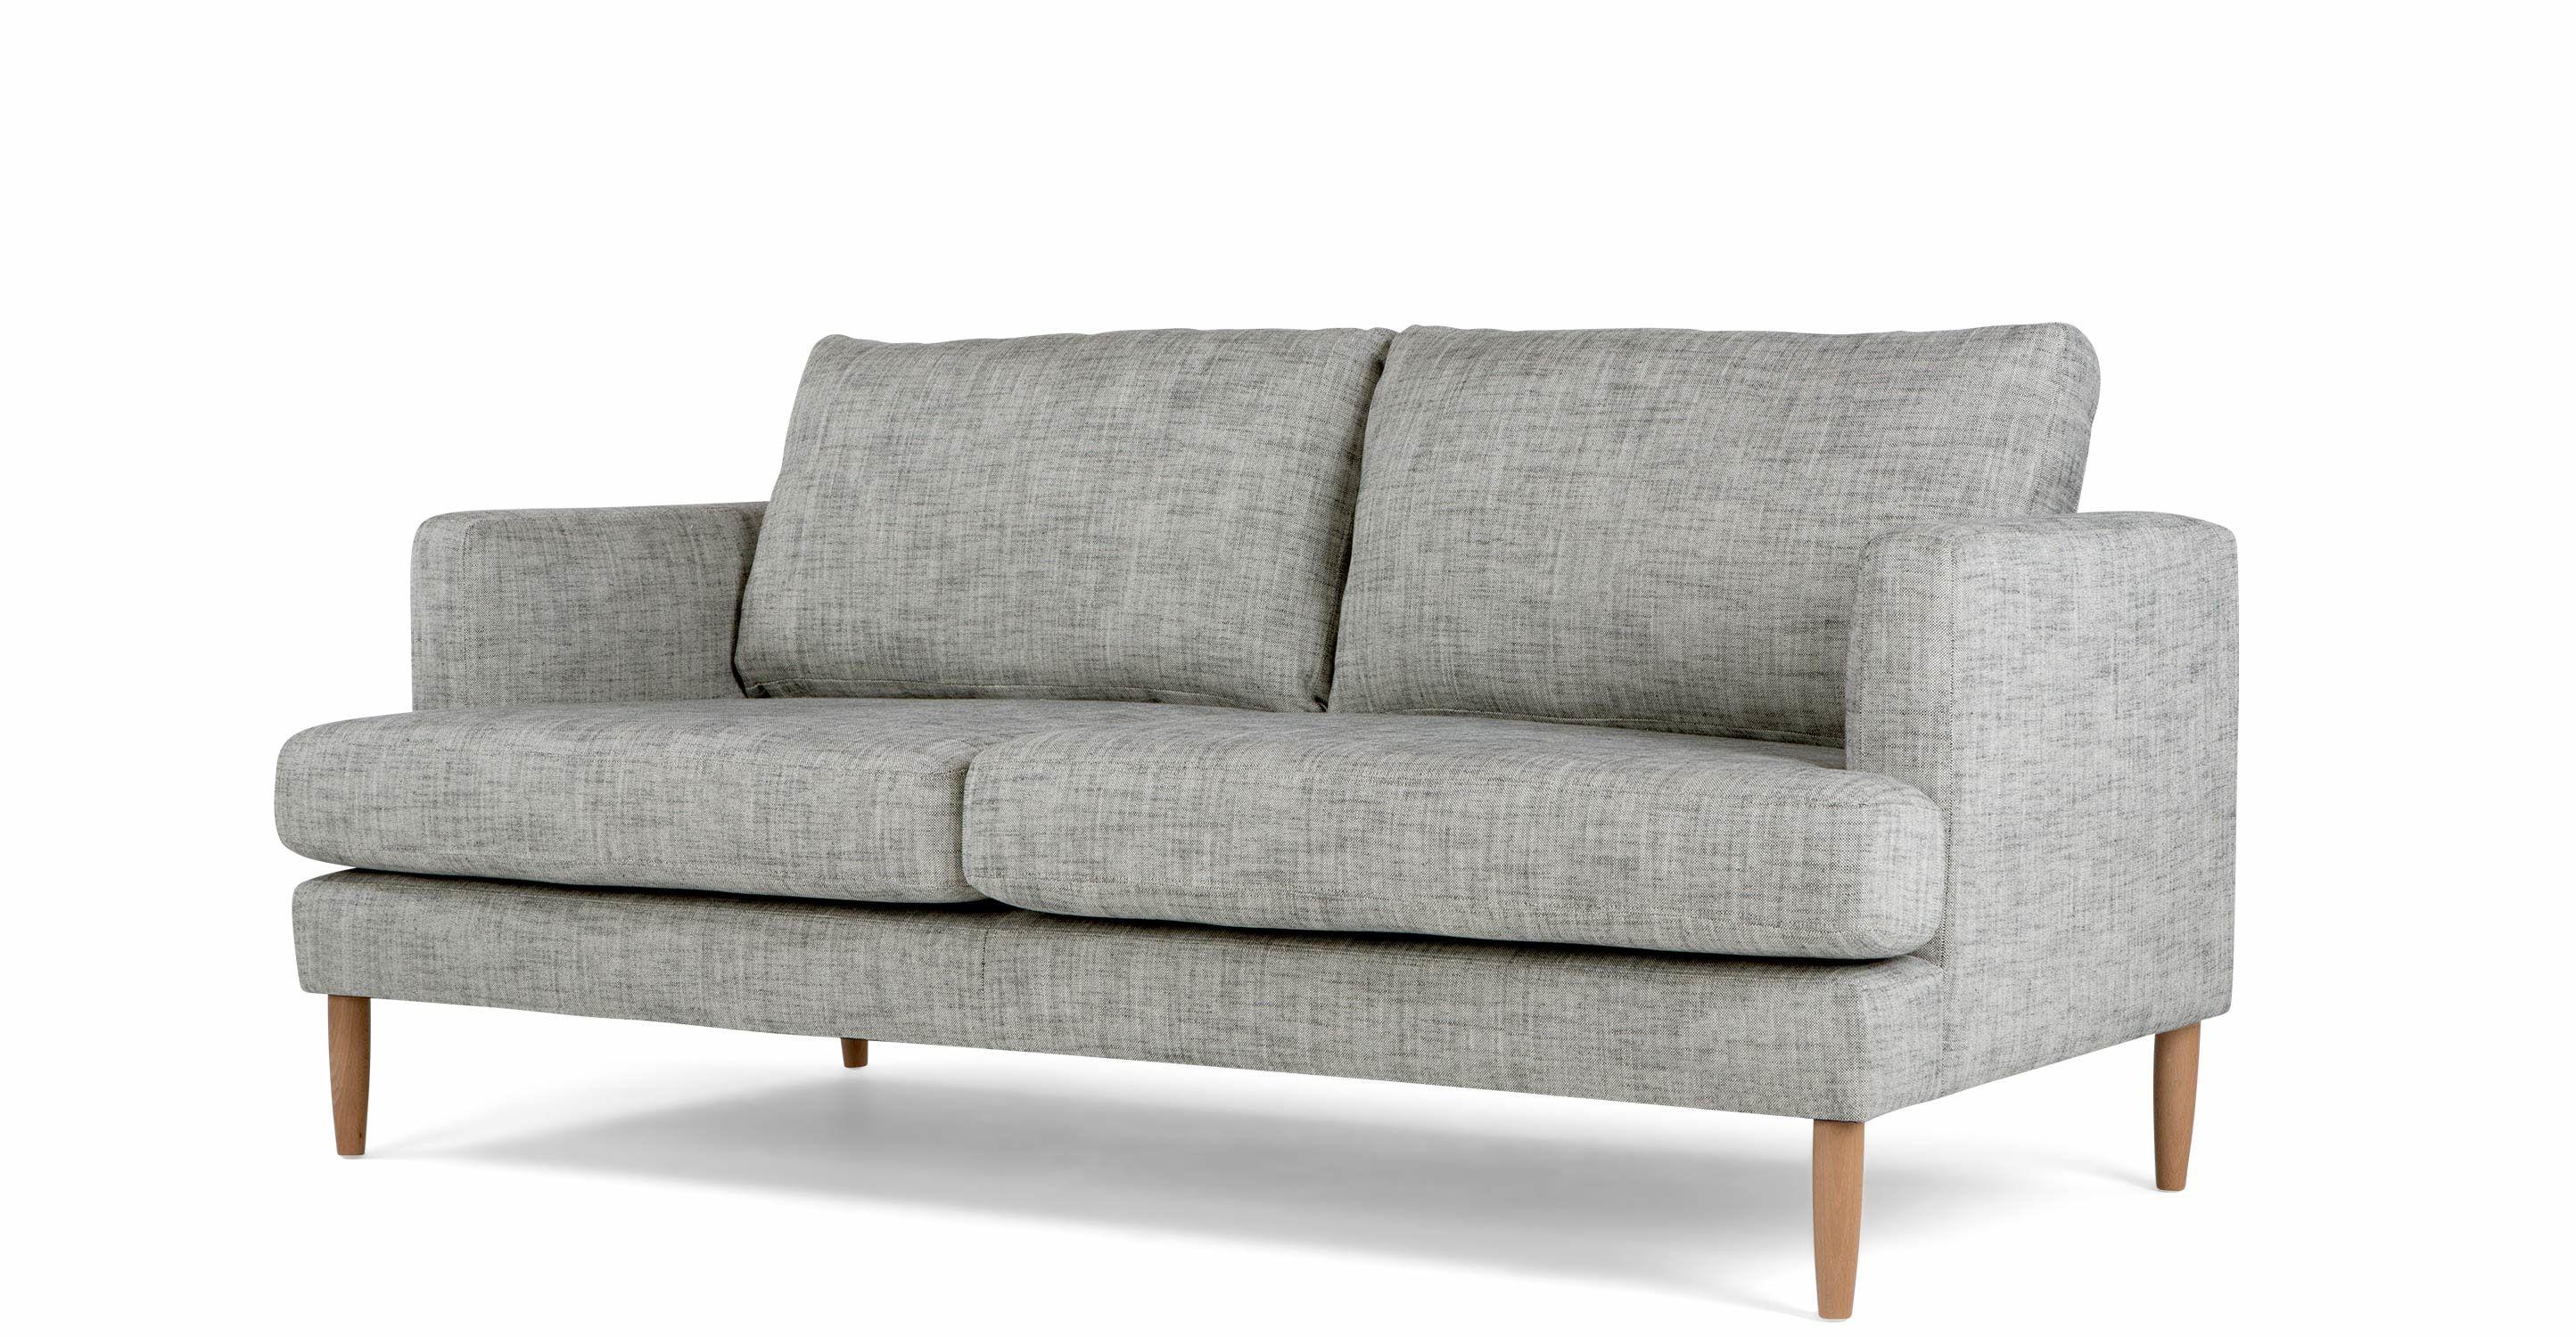 Kotka 2 Sitzer Sofa Entdecke Moderne Designmobel Jetzt Bei Made 2 Seater Sofa Sofa